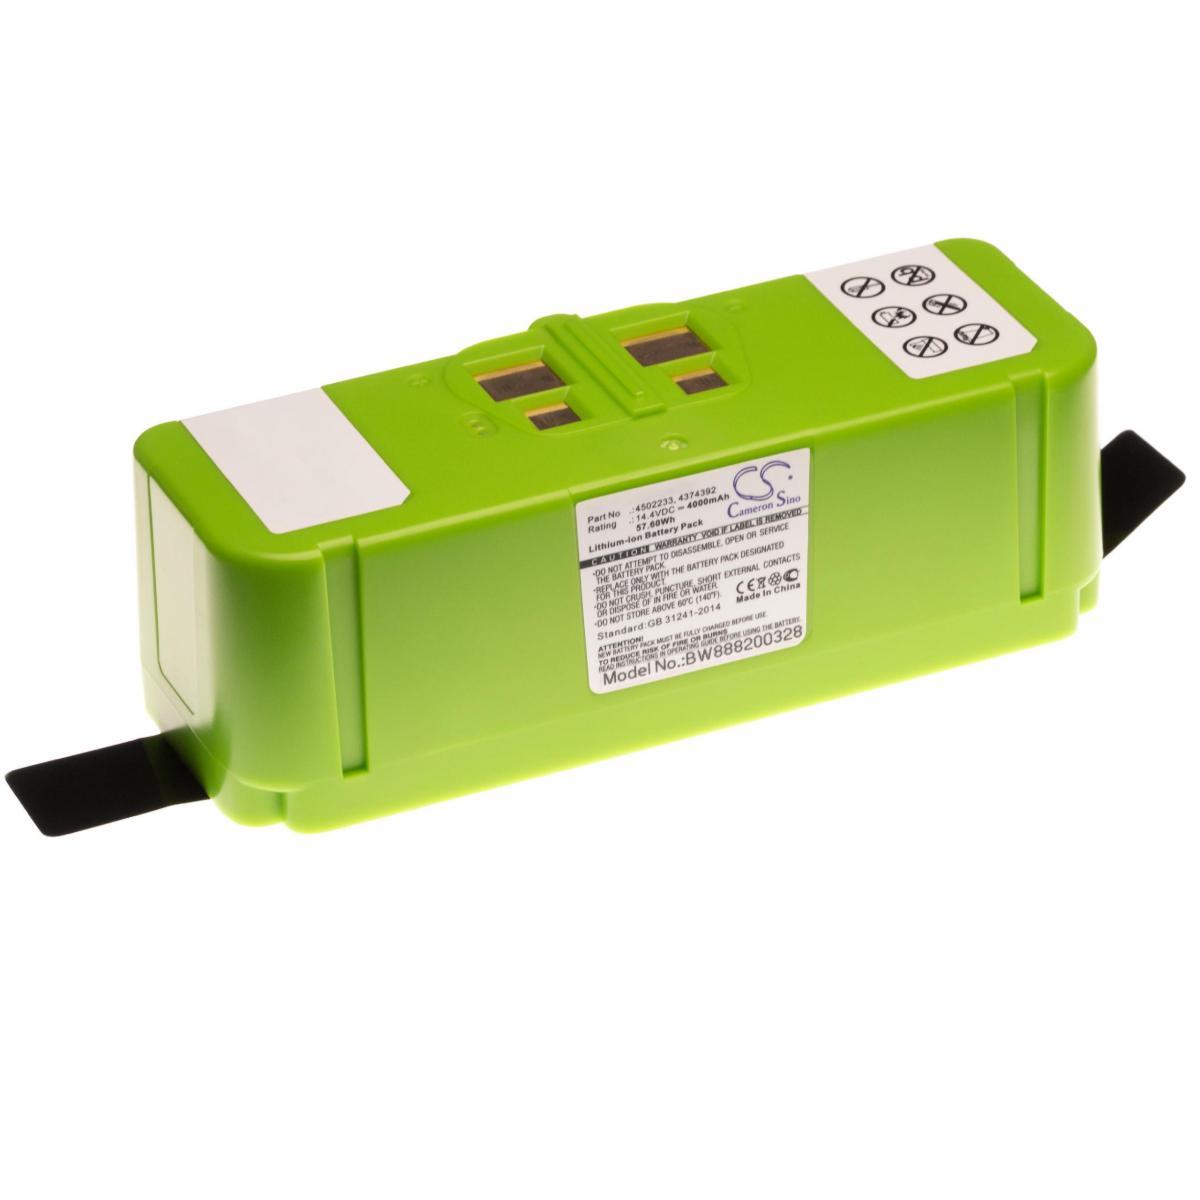 Vhbw vhbw Li-Ion batterie 4000mAh (14.4V) compatible avec iRobot Roomba 614, 615, 640, 652, 665, 670, 671, 675, 677, 680, 681